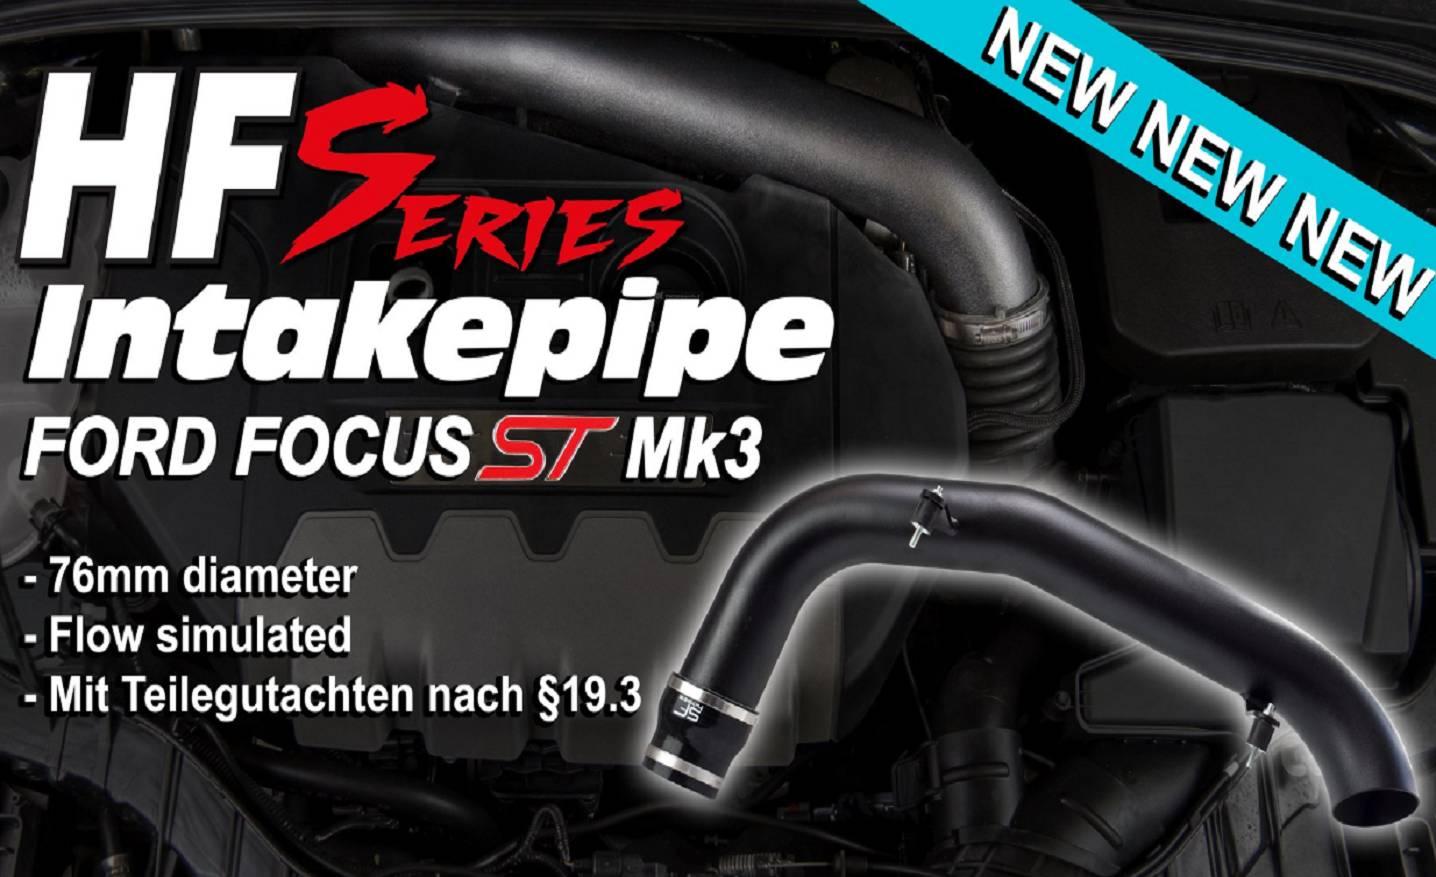 "HF-SERIES 3"" INTAKE FORD FOCUS ST250 MK3"